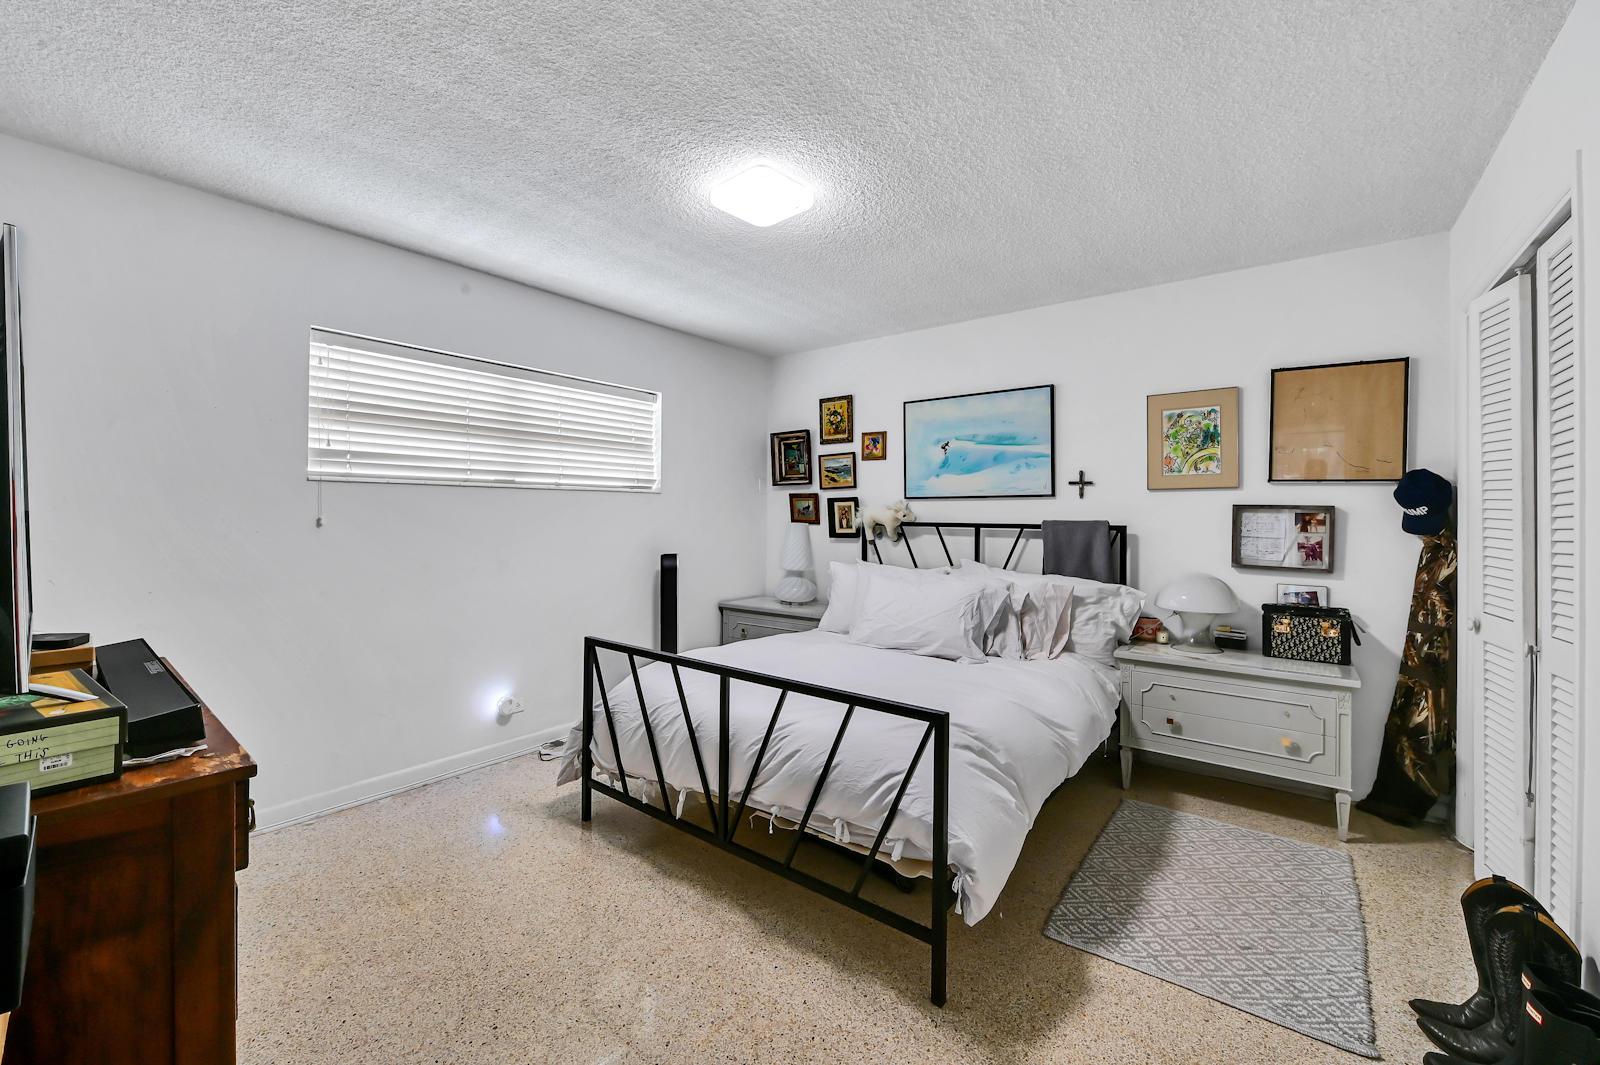 10 Bed room 02